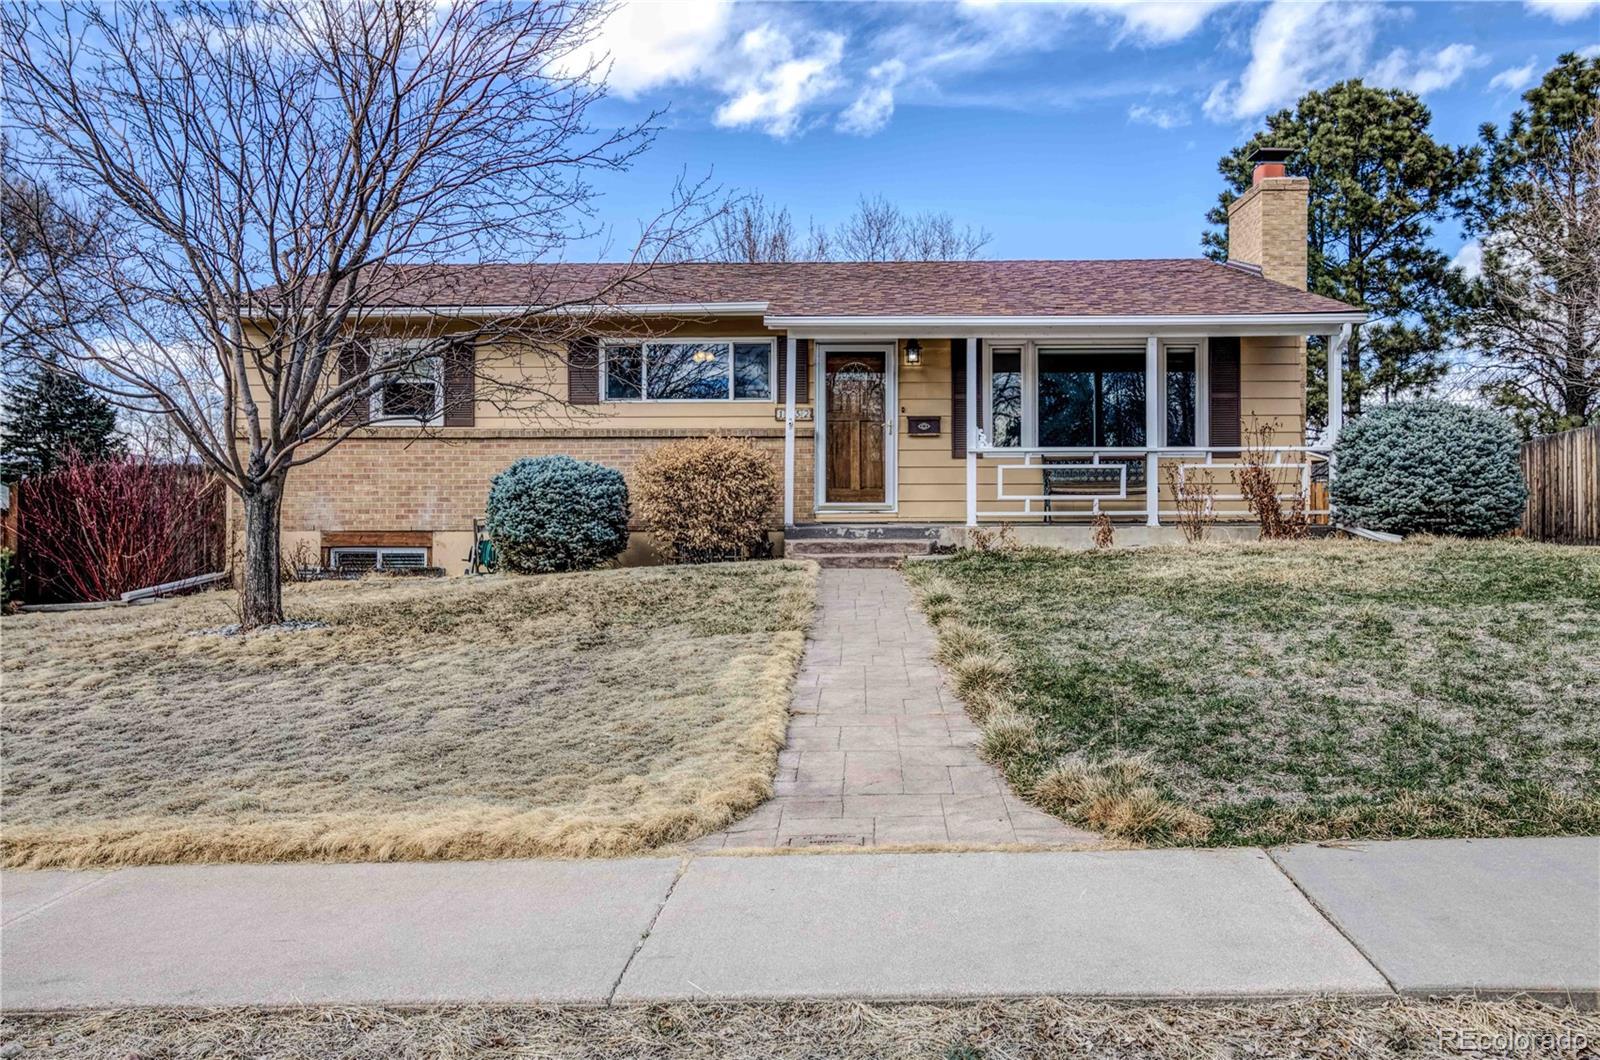 MLS# 5043109 - 3 - 1832 Northview Drive, Colorado Springs, CO 80909